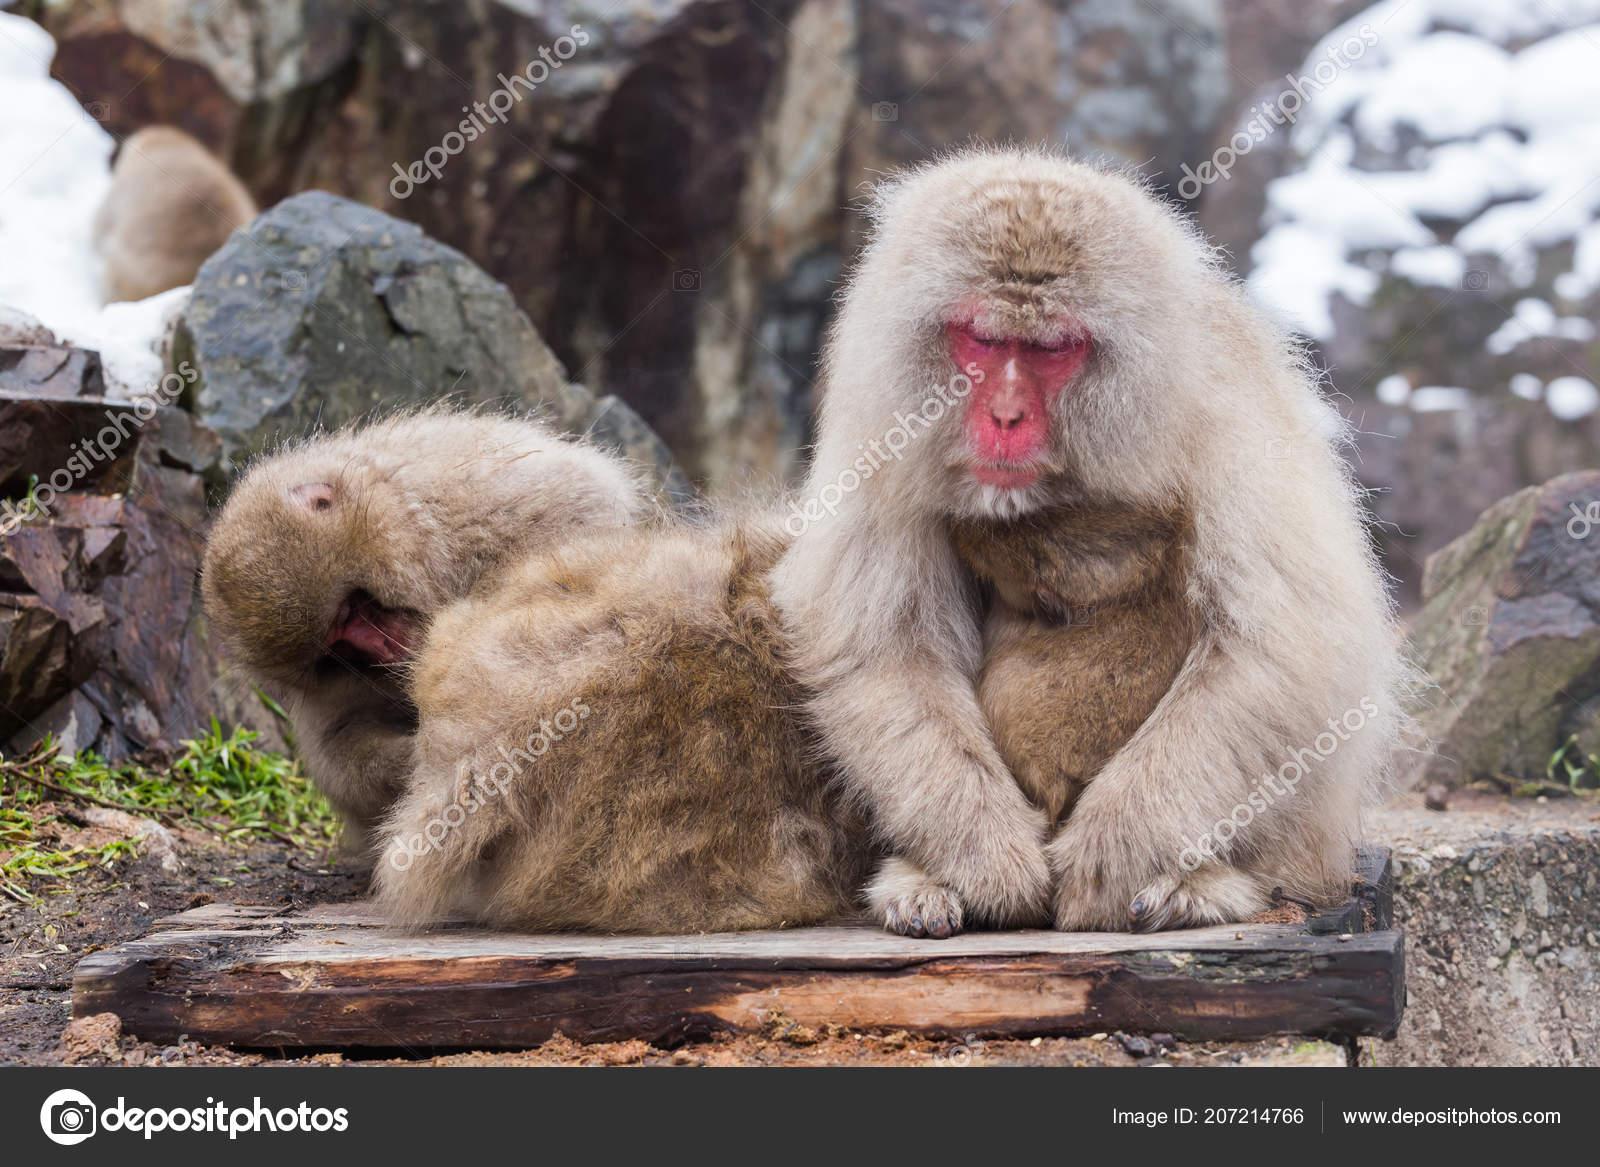 Monos Natural Onsen Aguas Termales Situado Mono Nieve Nagano Japón